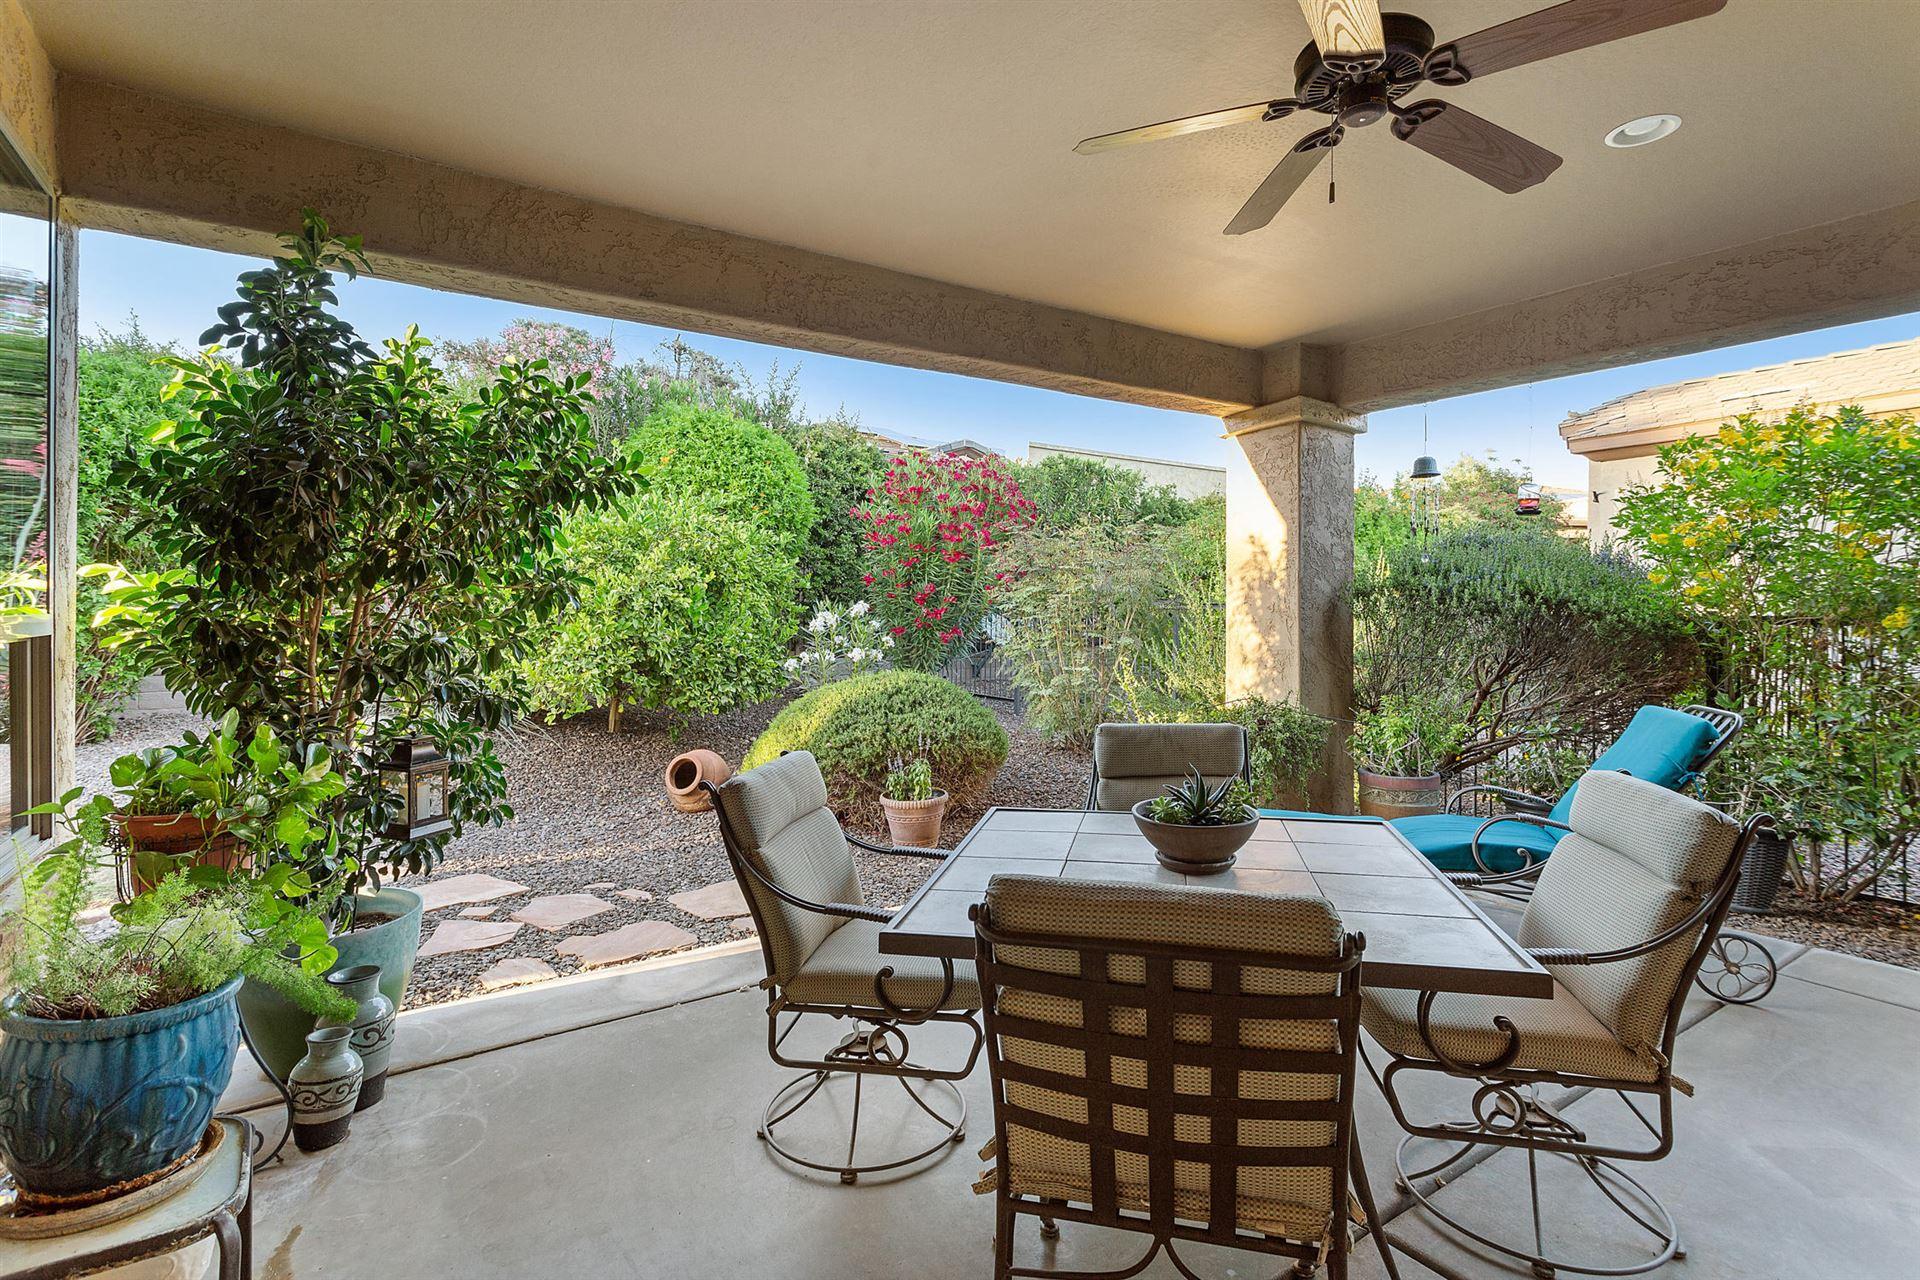 Photo of 12980 W OBERLIN Way, Peoria, AZ 85383 (MLS # 6232393)